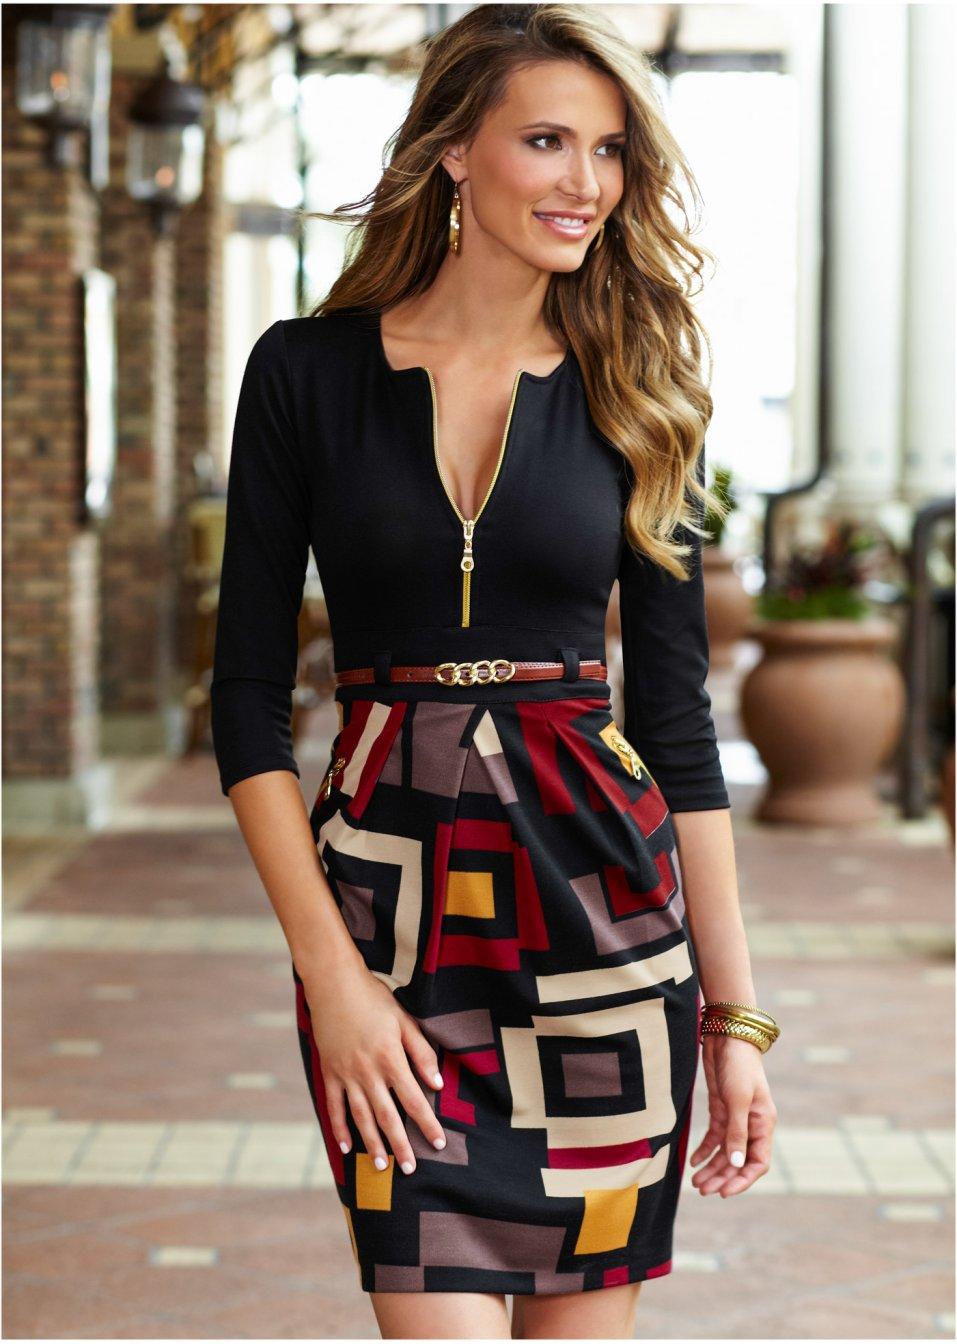 vestido com saia estampada preto comprar on line. Black Bedroom Furniture Sets. Home Design Ideas